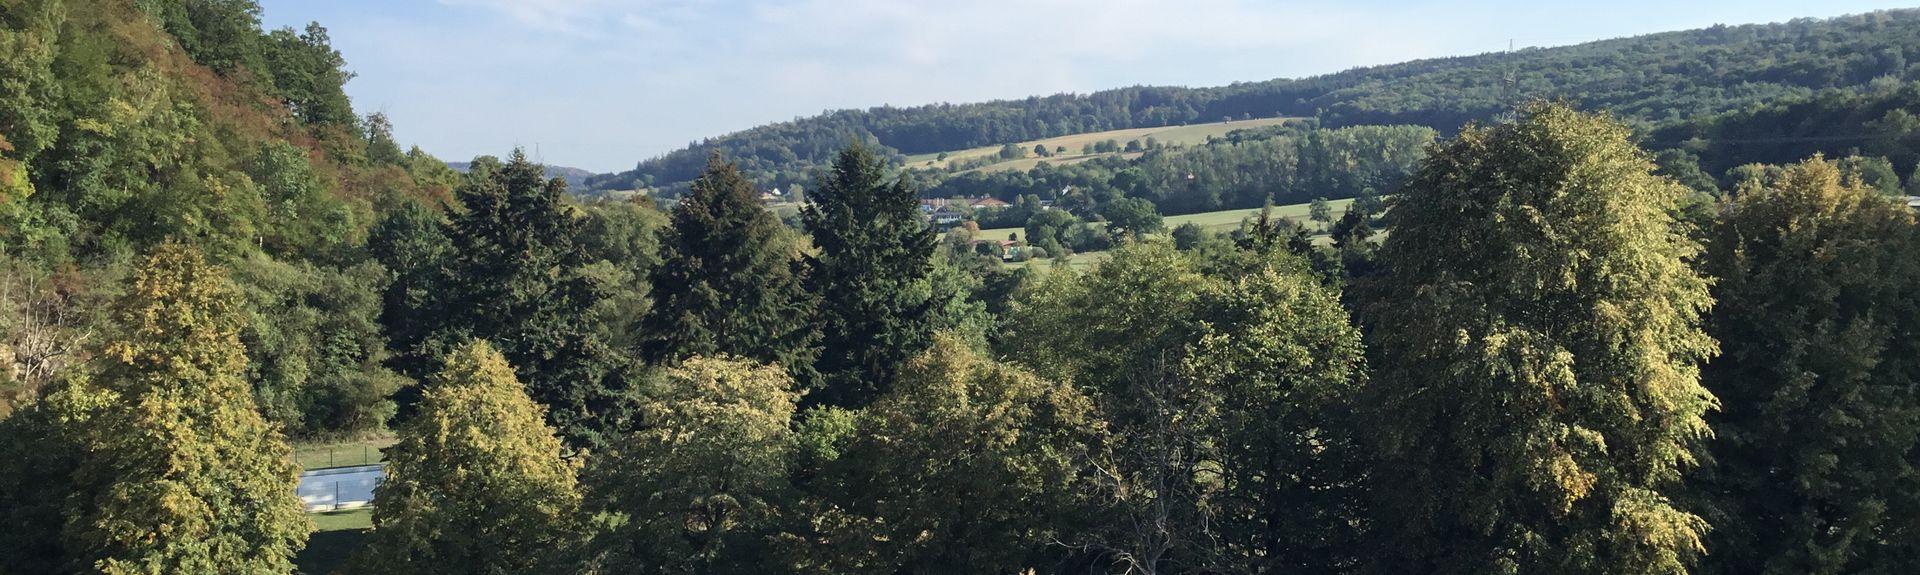 Dillenburg, Hessen, Germany